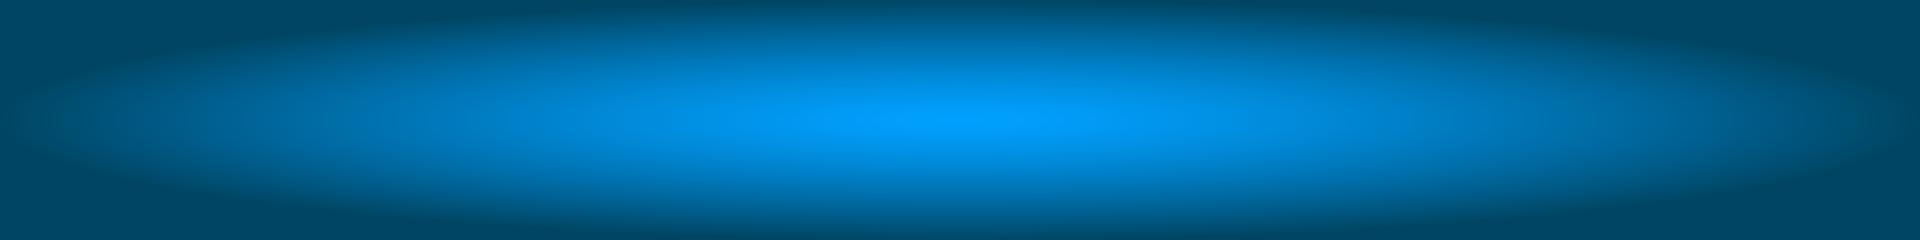 fundo_azul_8x1_RGB copiar.png